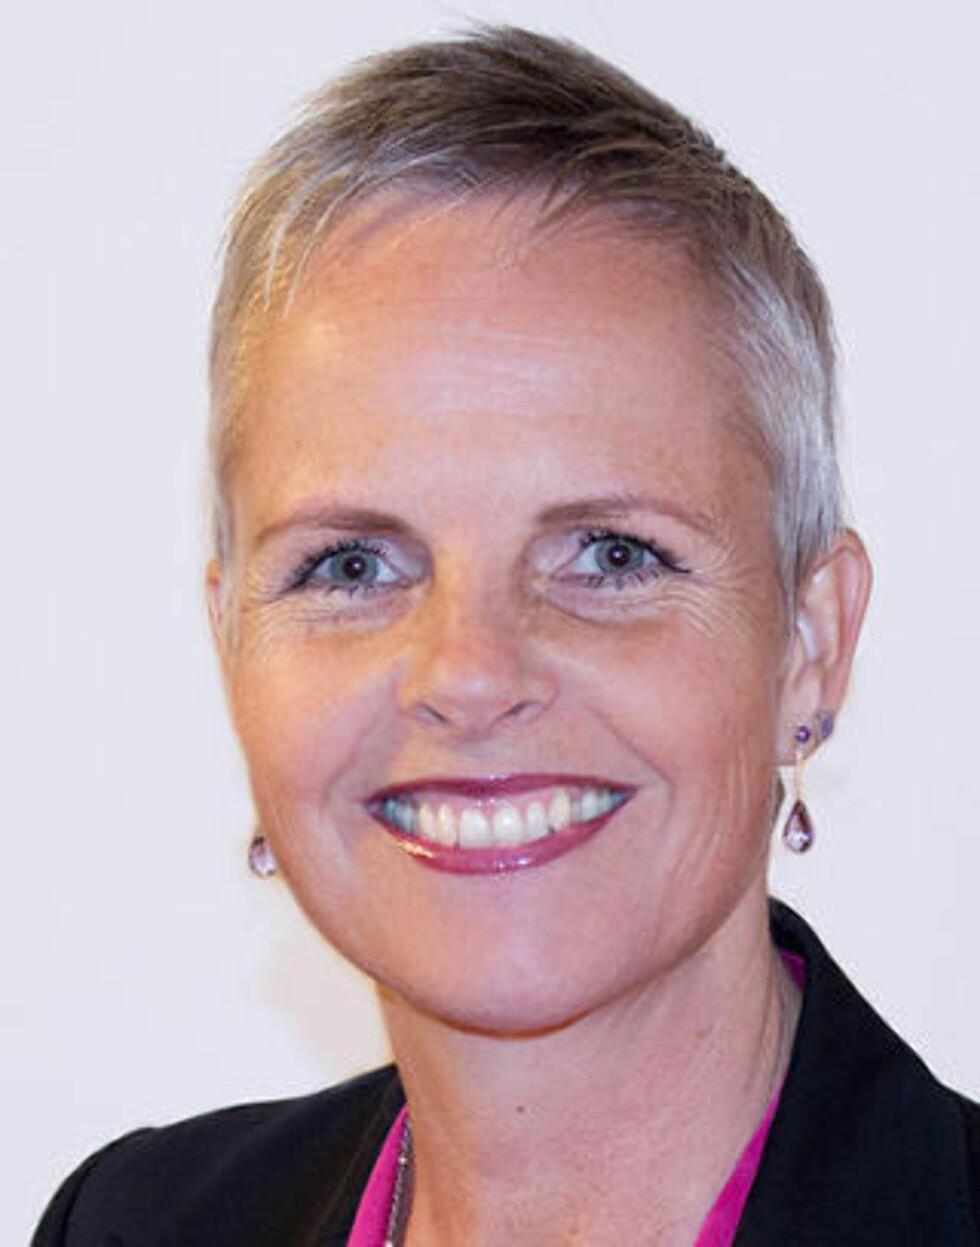 REKTOR: Janecke Aarnæs er rektor ved Oslo internasjonale skole, hvor prinsesse Ingrid Alexandra blir elev til høsten. Foto: Privat